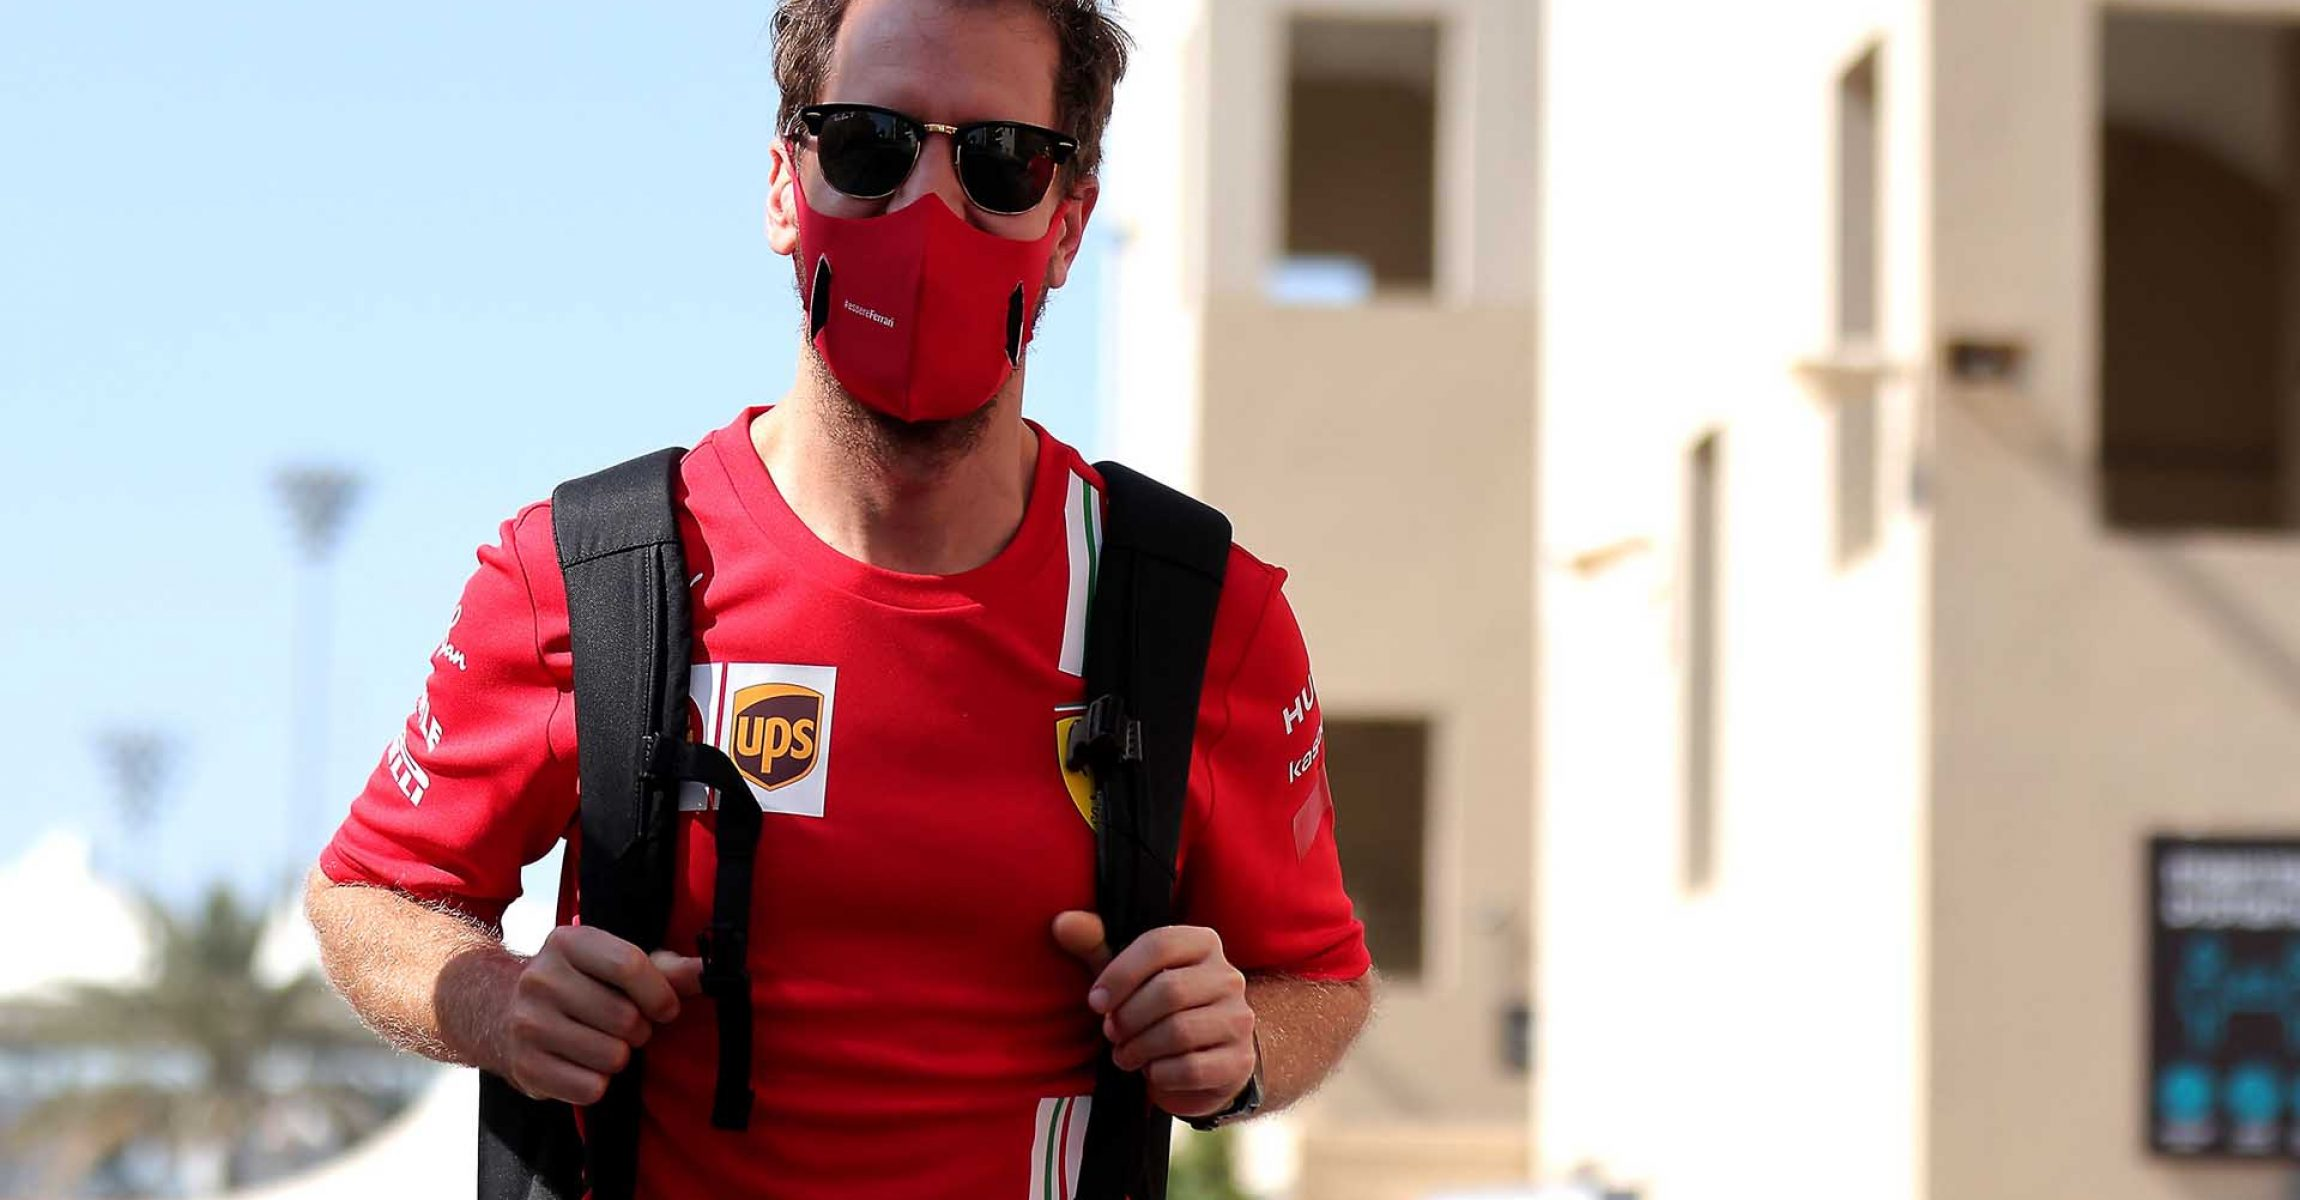 GP ABU DHABI  F1/2020 - GIOVEDÌ  10/12/2020   credit: @Scuderia Ferrari Press Office Sebastian Vettel Ferrari